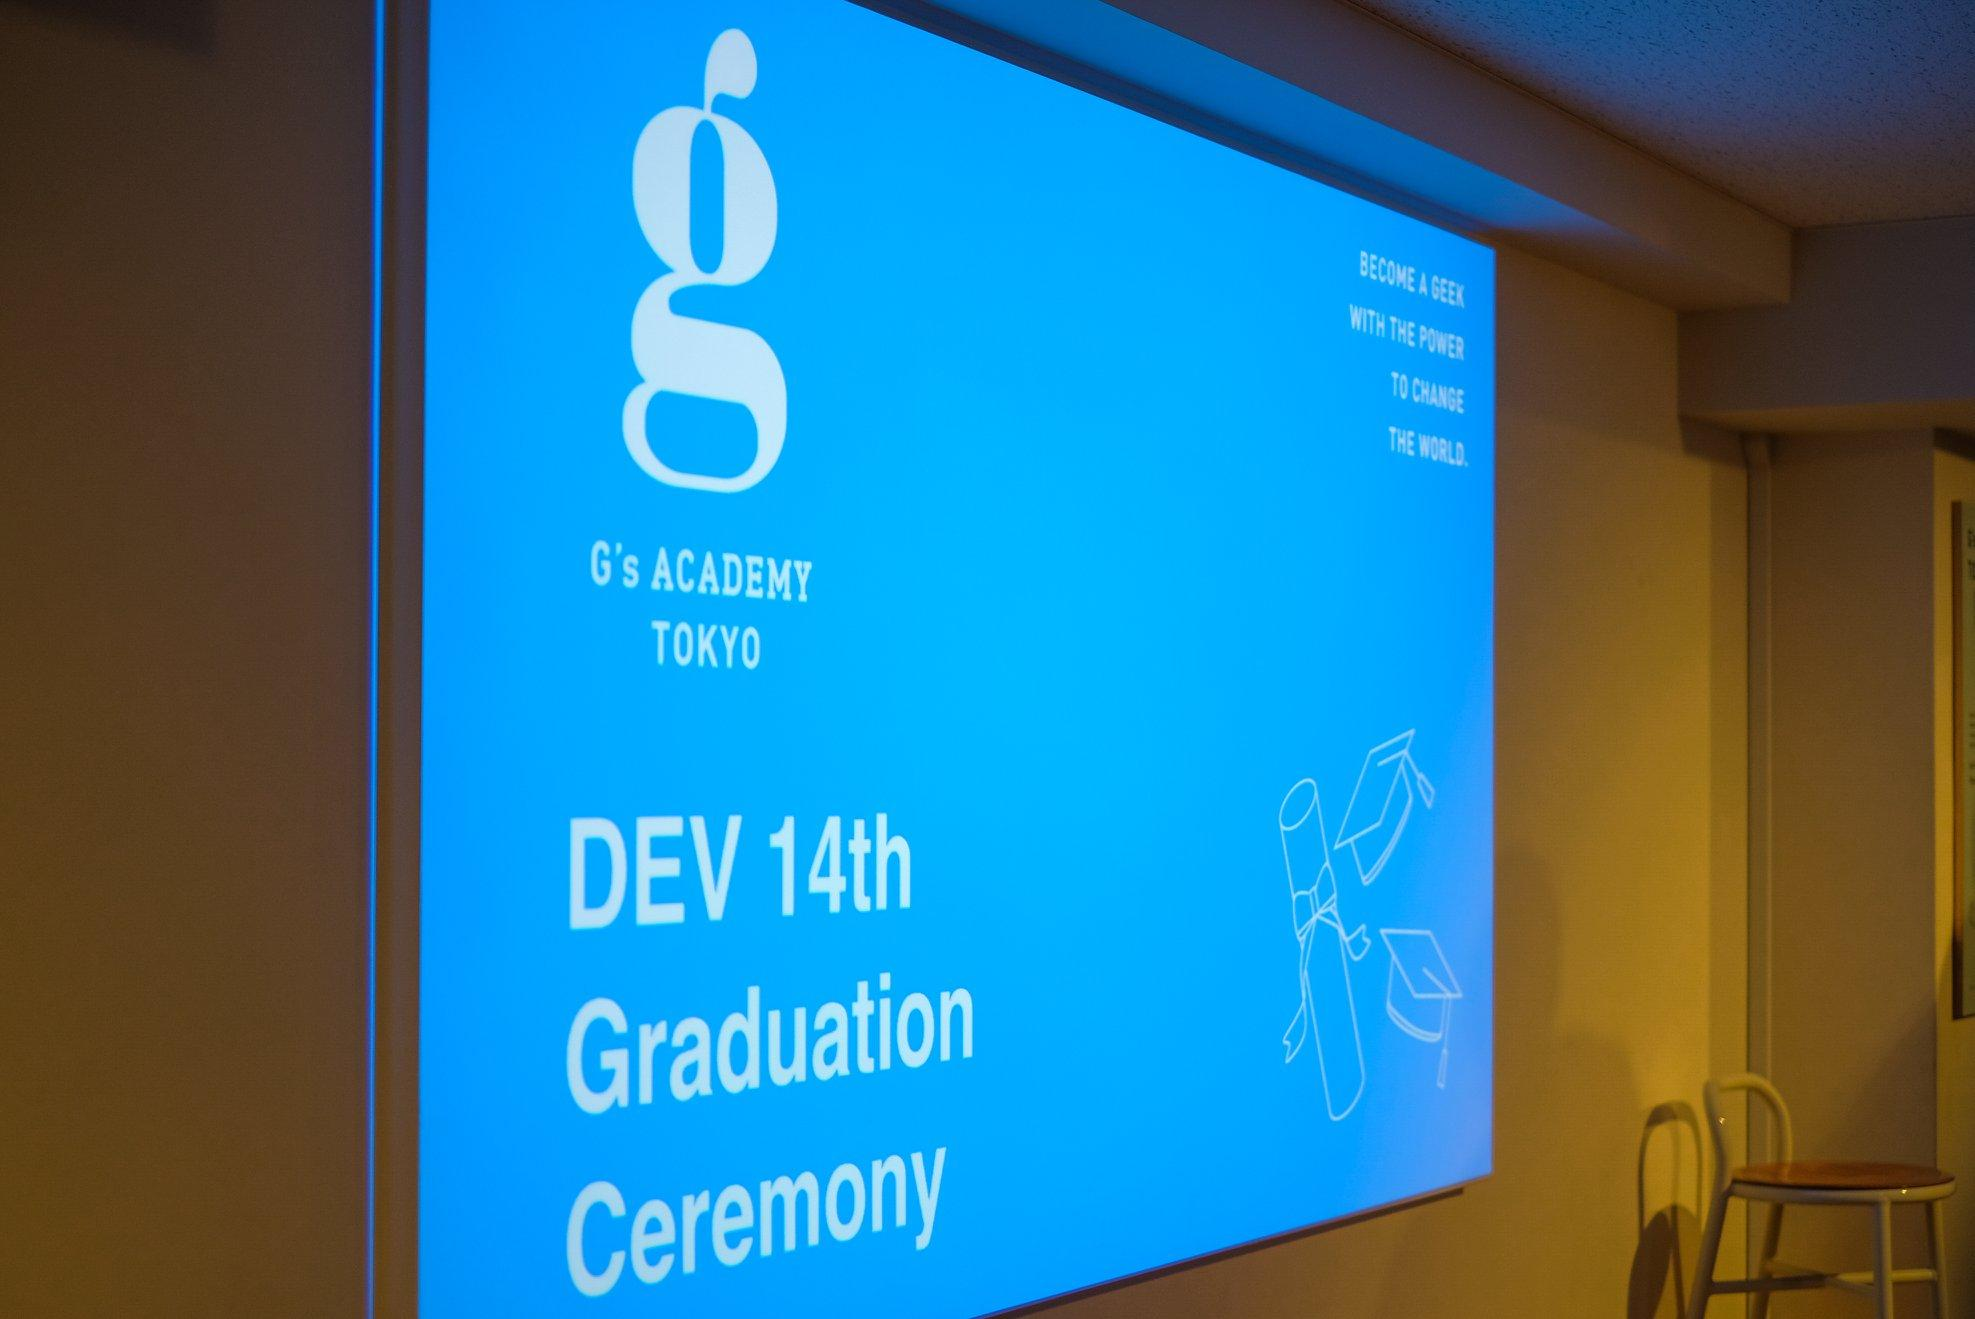 graduation-ceremony.jpg